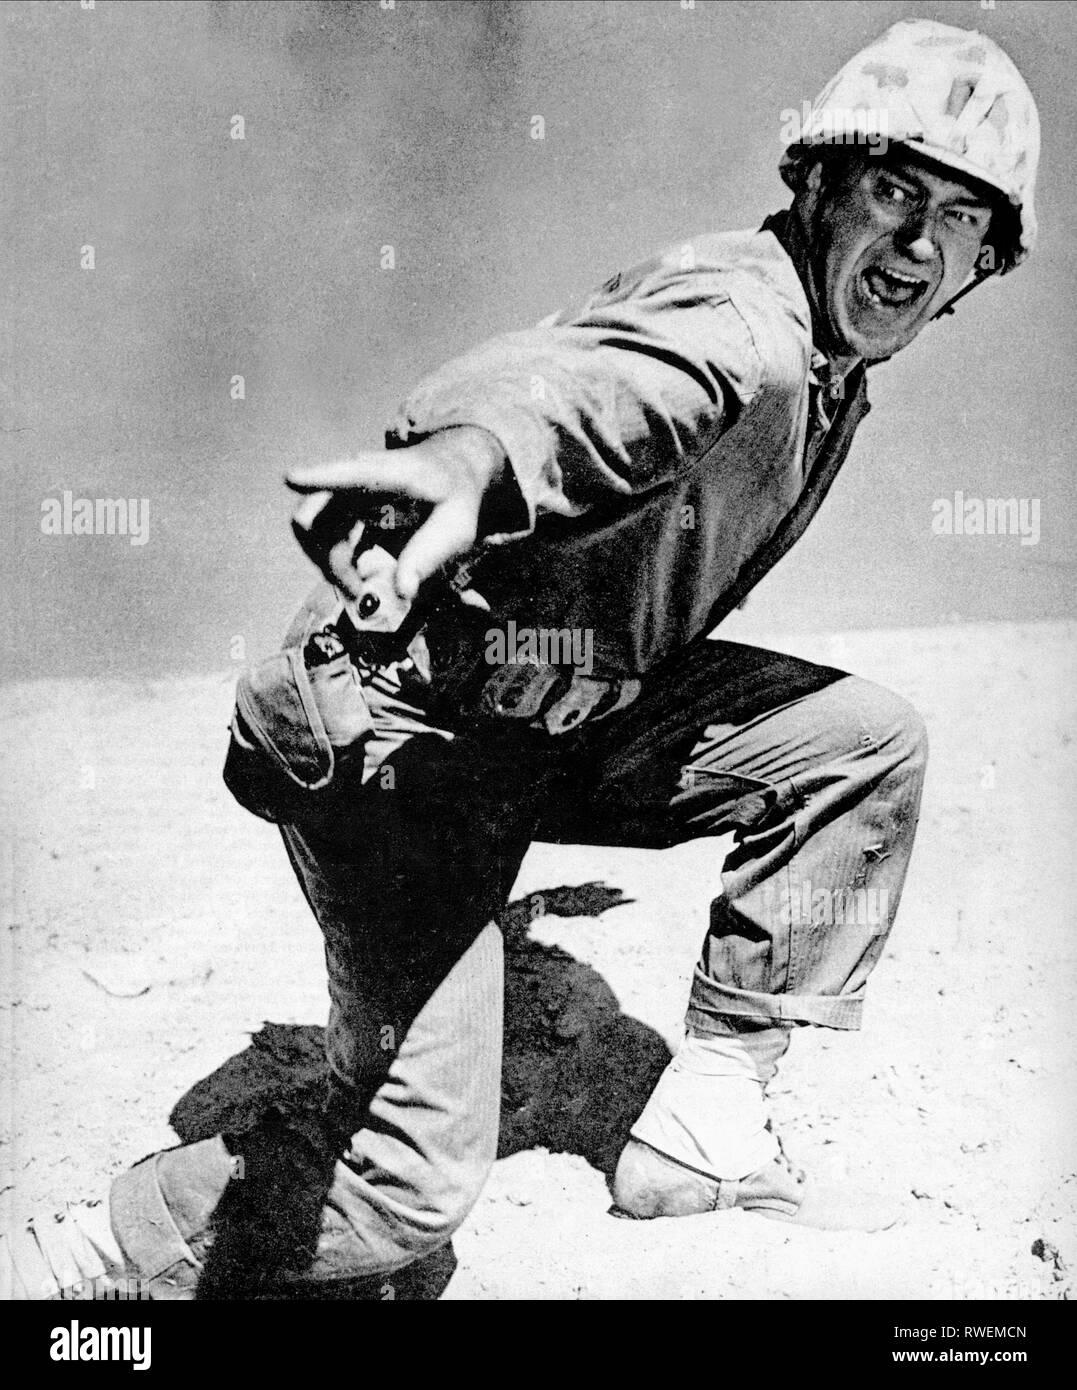 JOHN WAYNE, SANDS OF IWO JIMA, 1949 - Stock Image